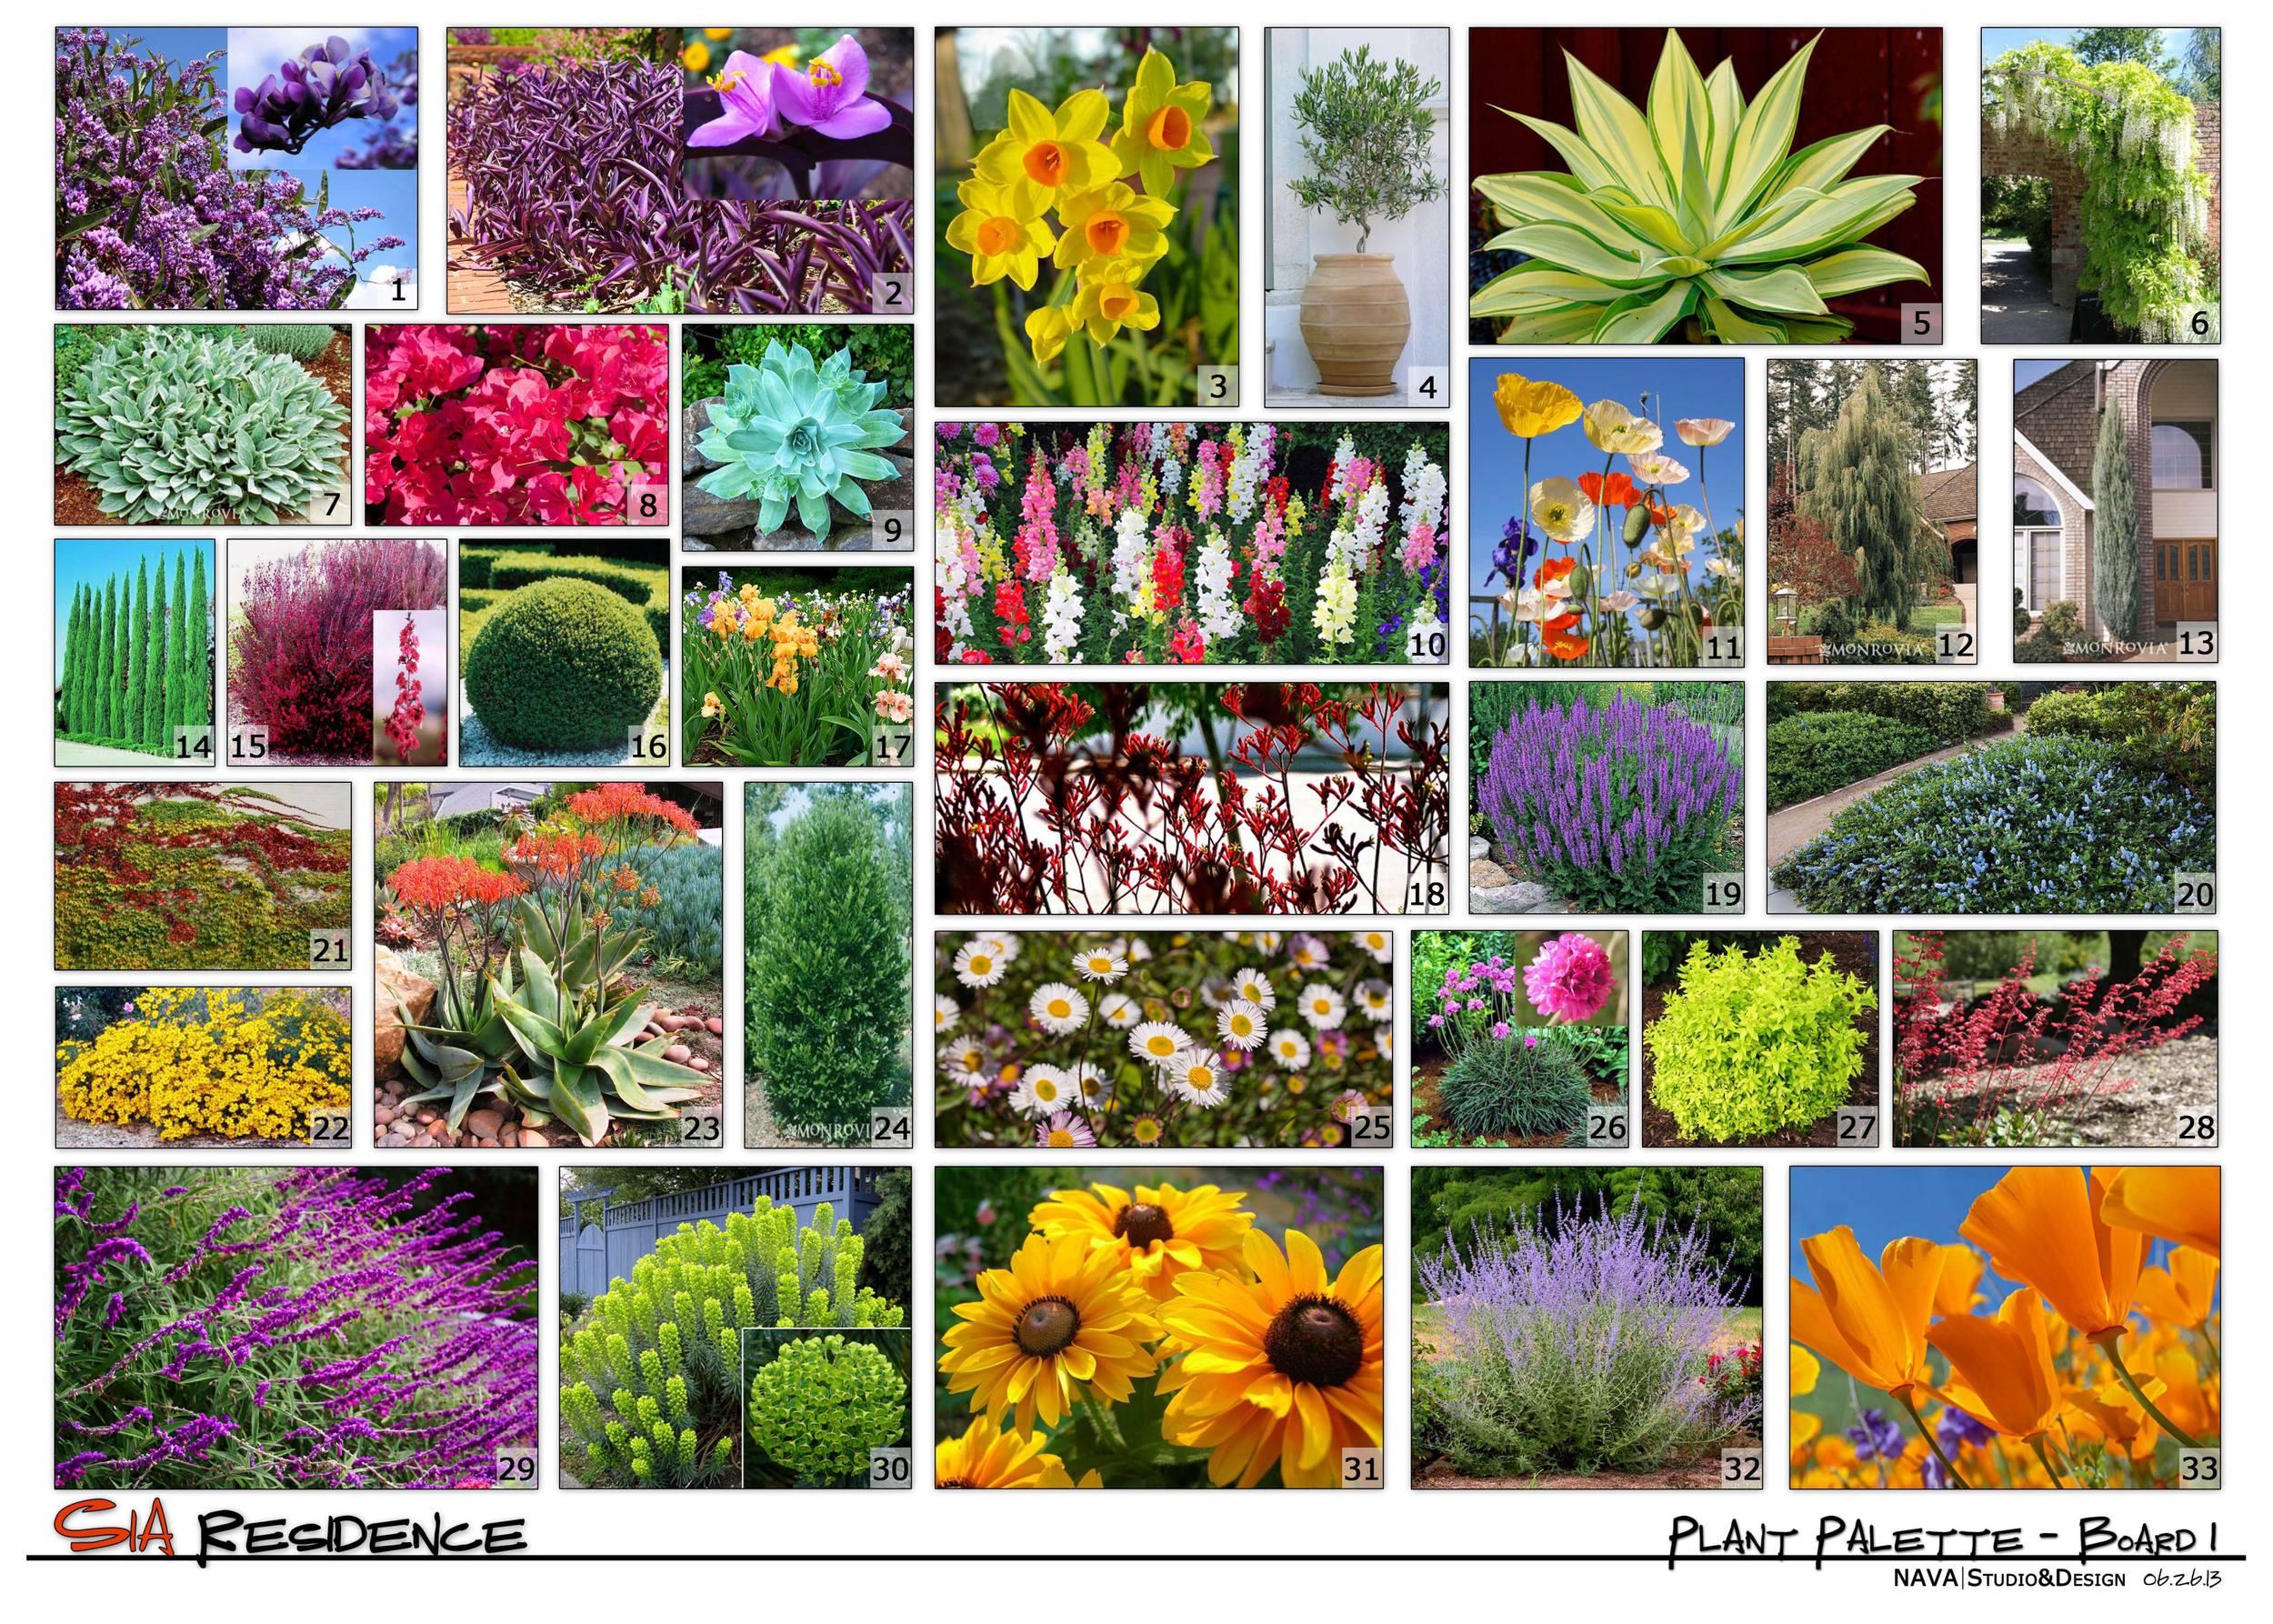 Conceptual Plant Palette_Board 1.jpg